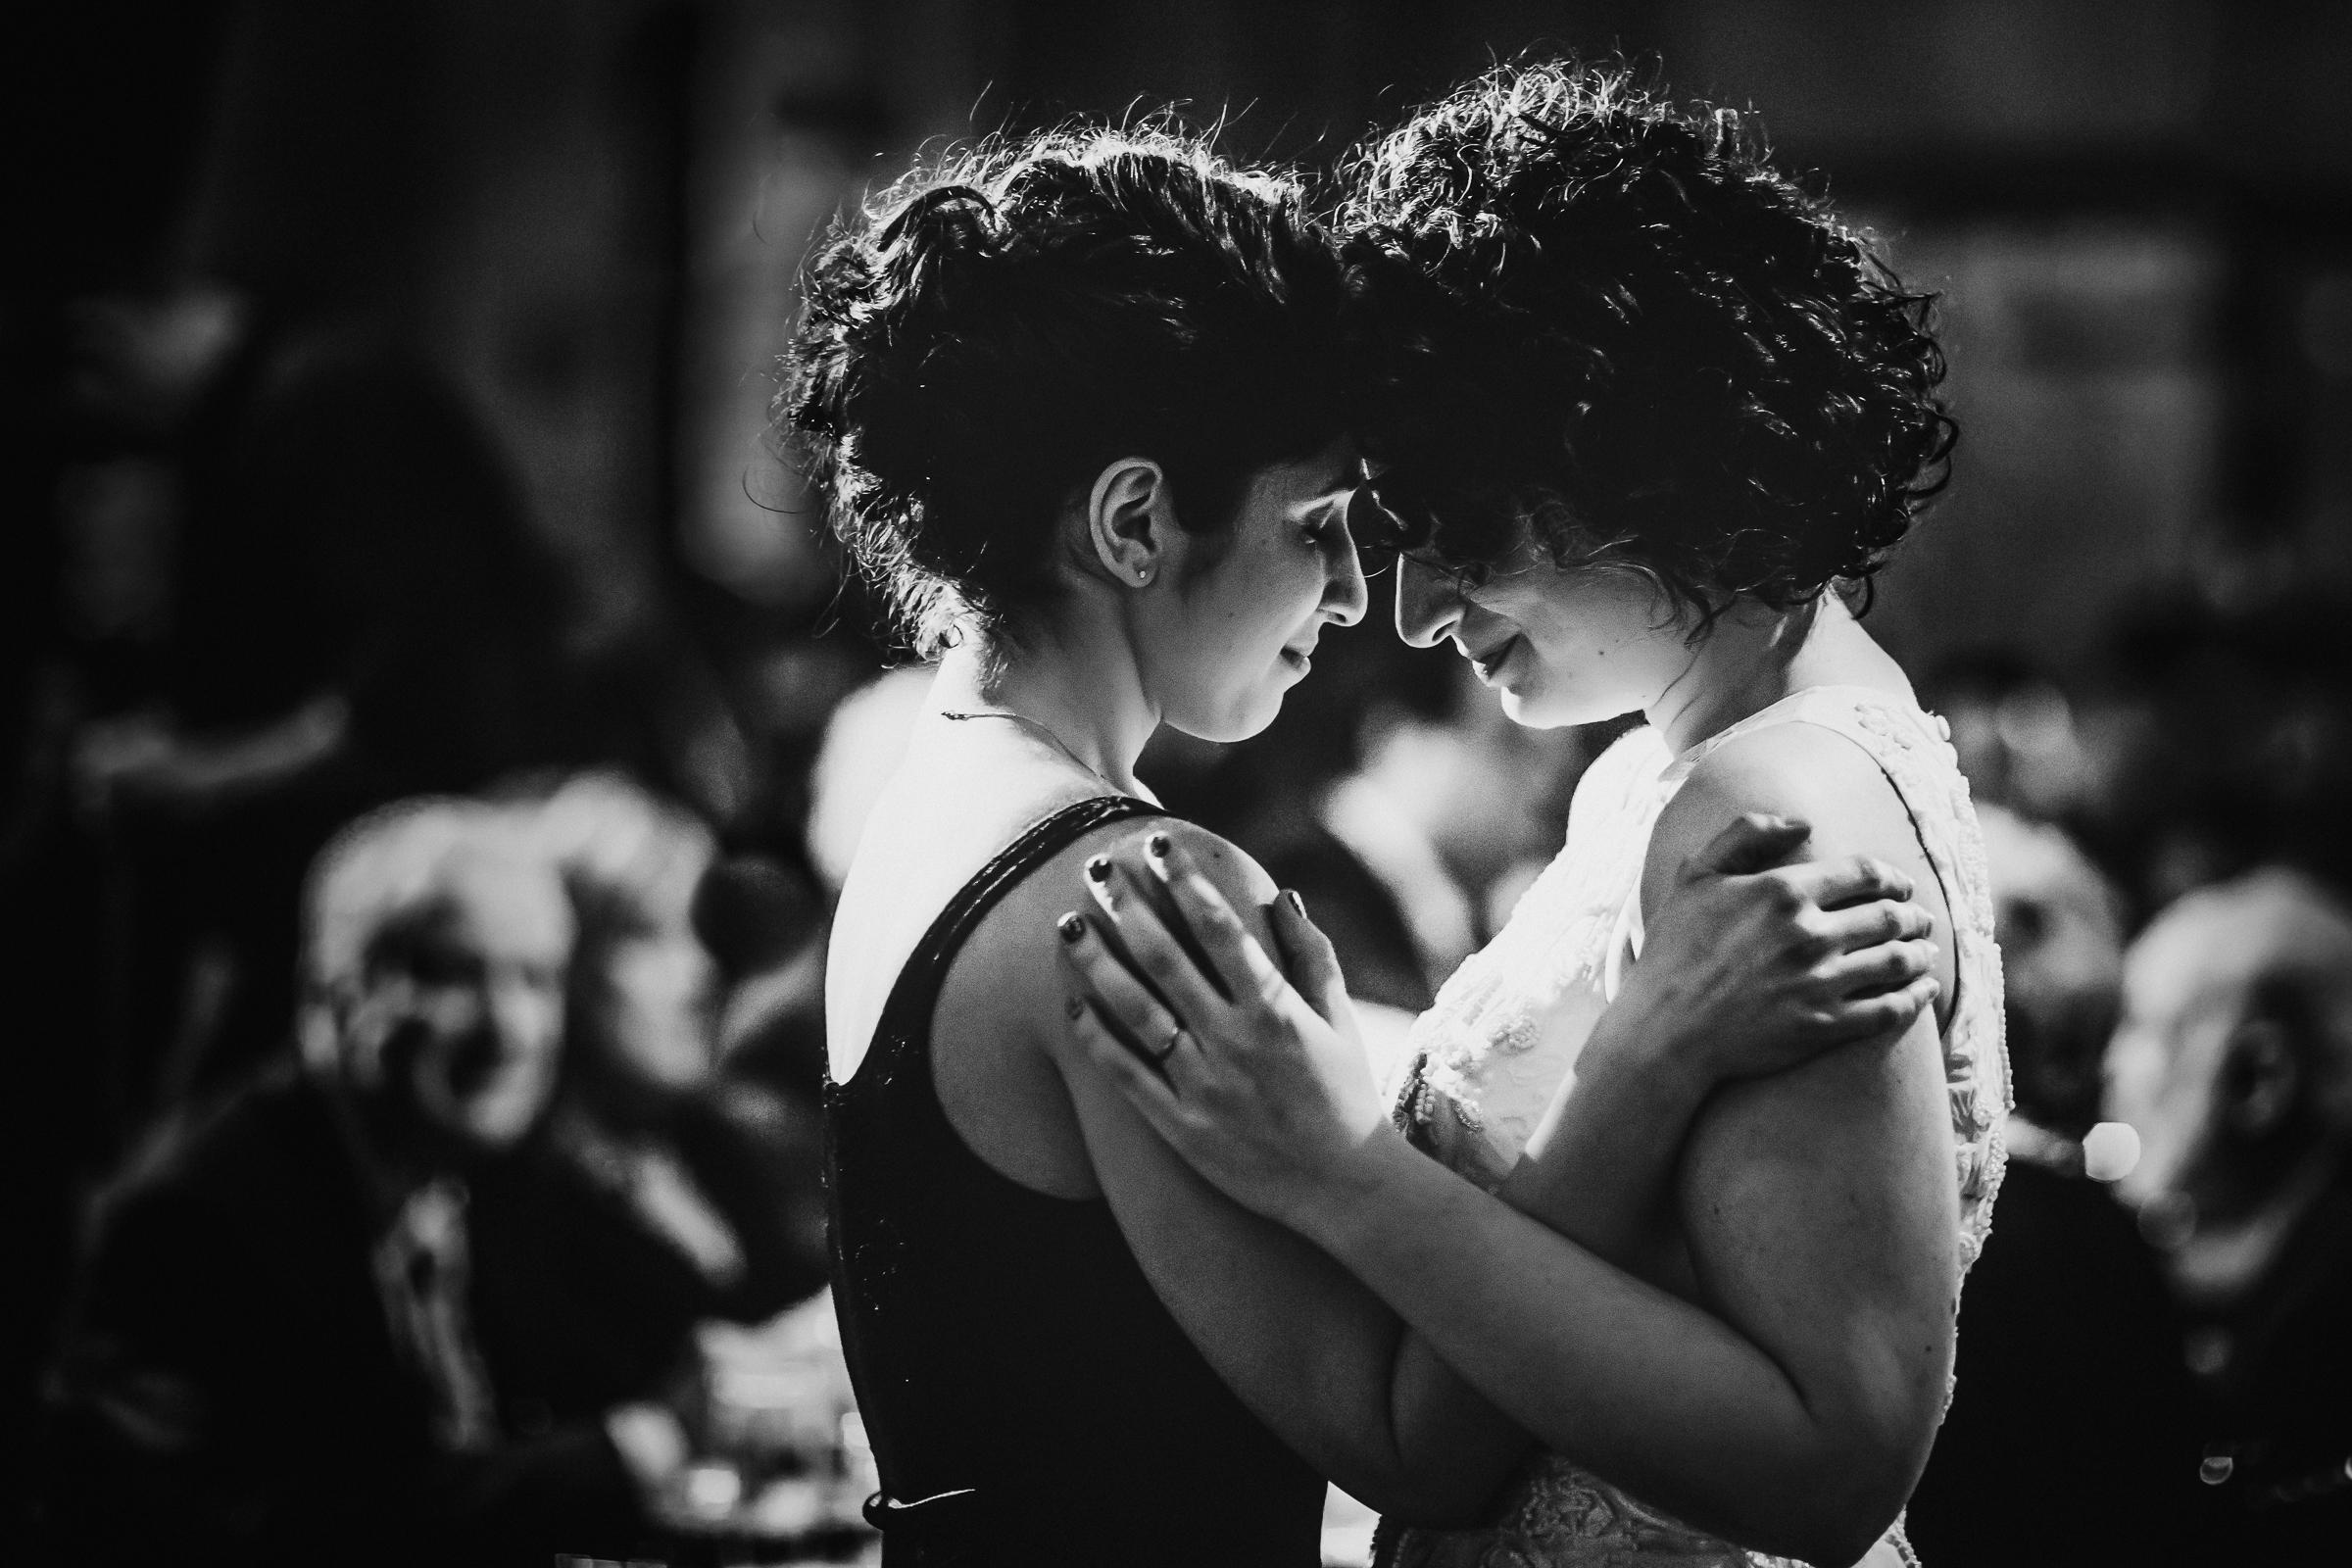 New-York-Documentary-Wedding-Photography-Best-Of-2017-by-Elvira-Kalviste-Photography-72.jpg